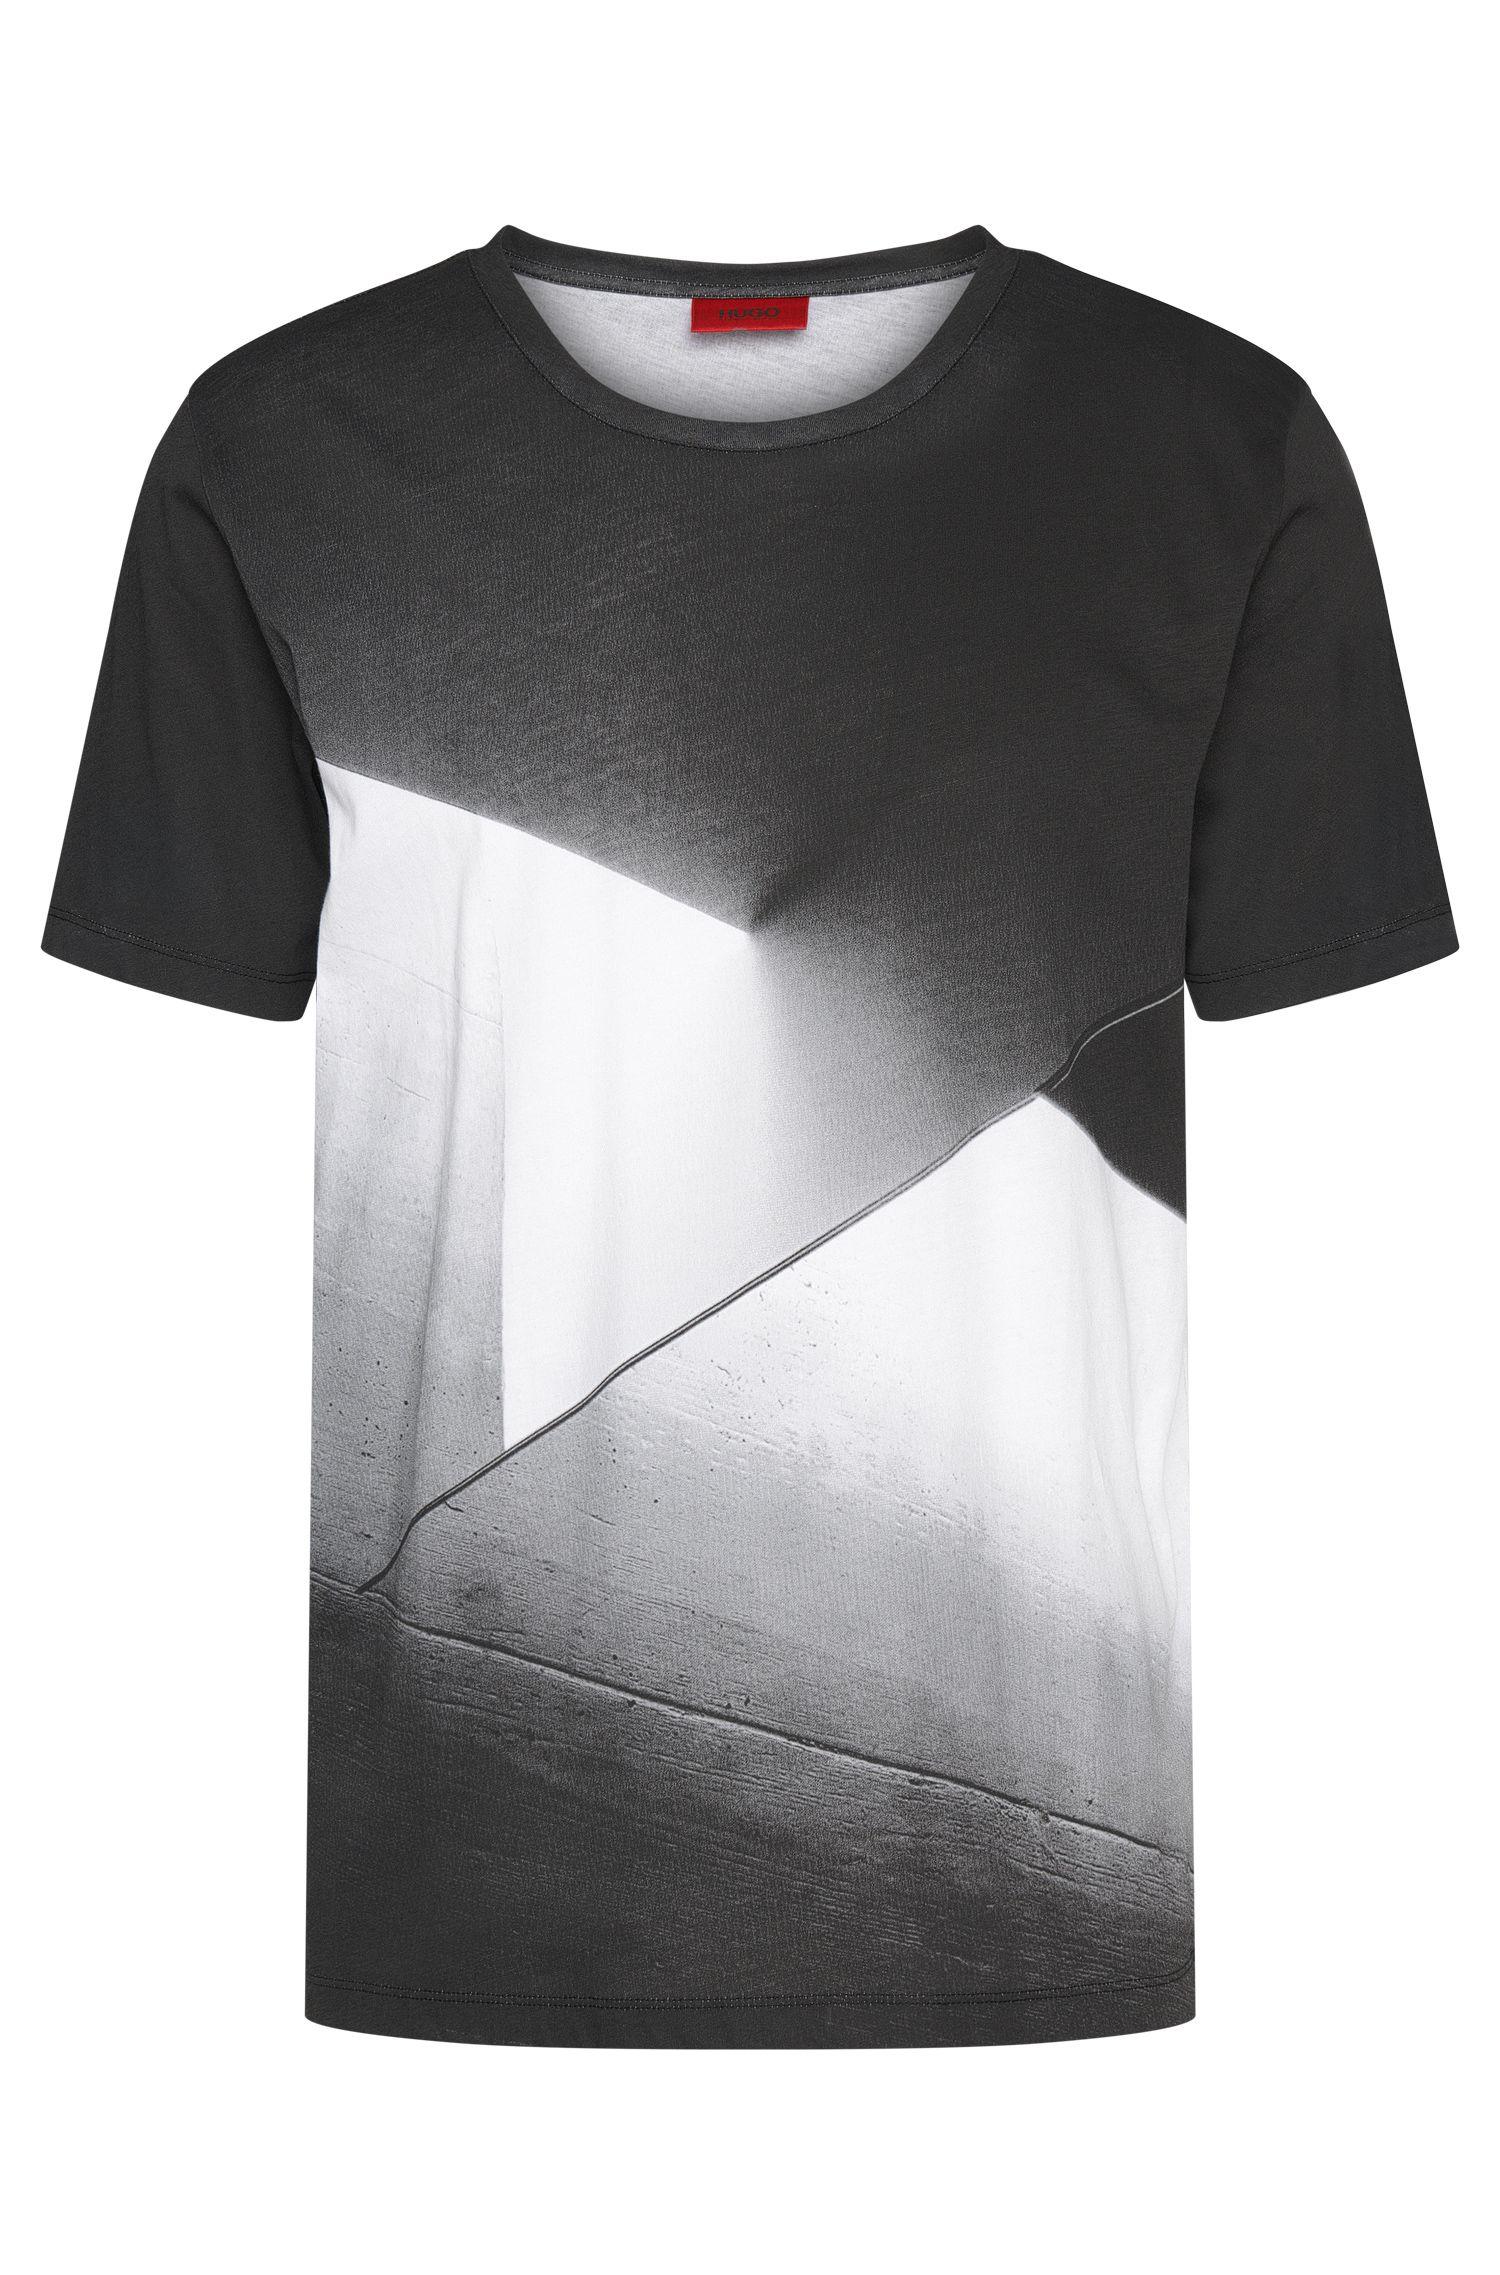 Cotton Printed T-Shirt | Dicino